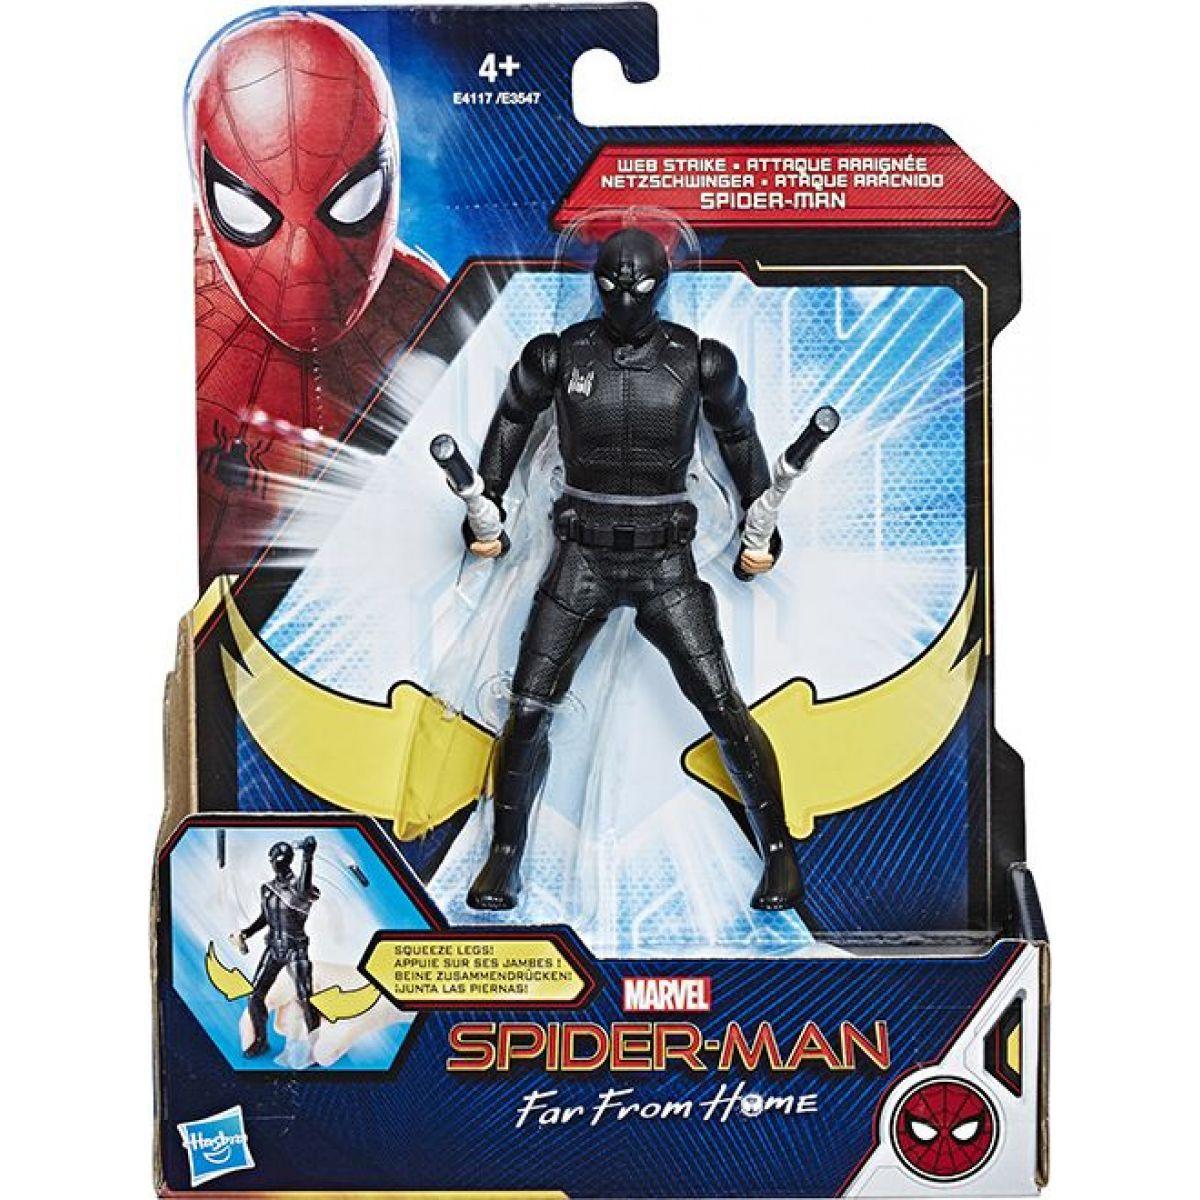 Hasbro Spider-man Filmová figurka nunčaky